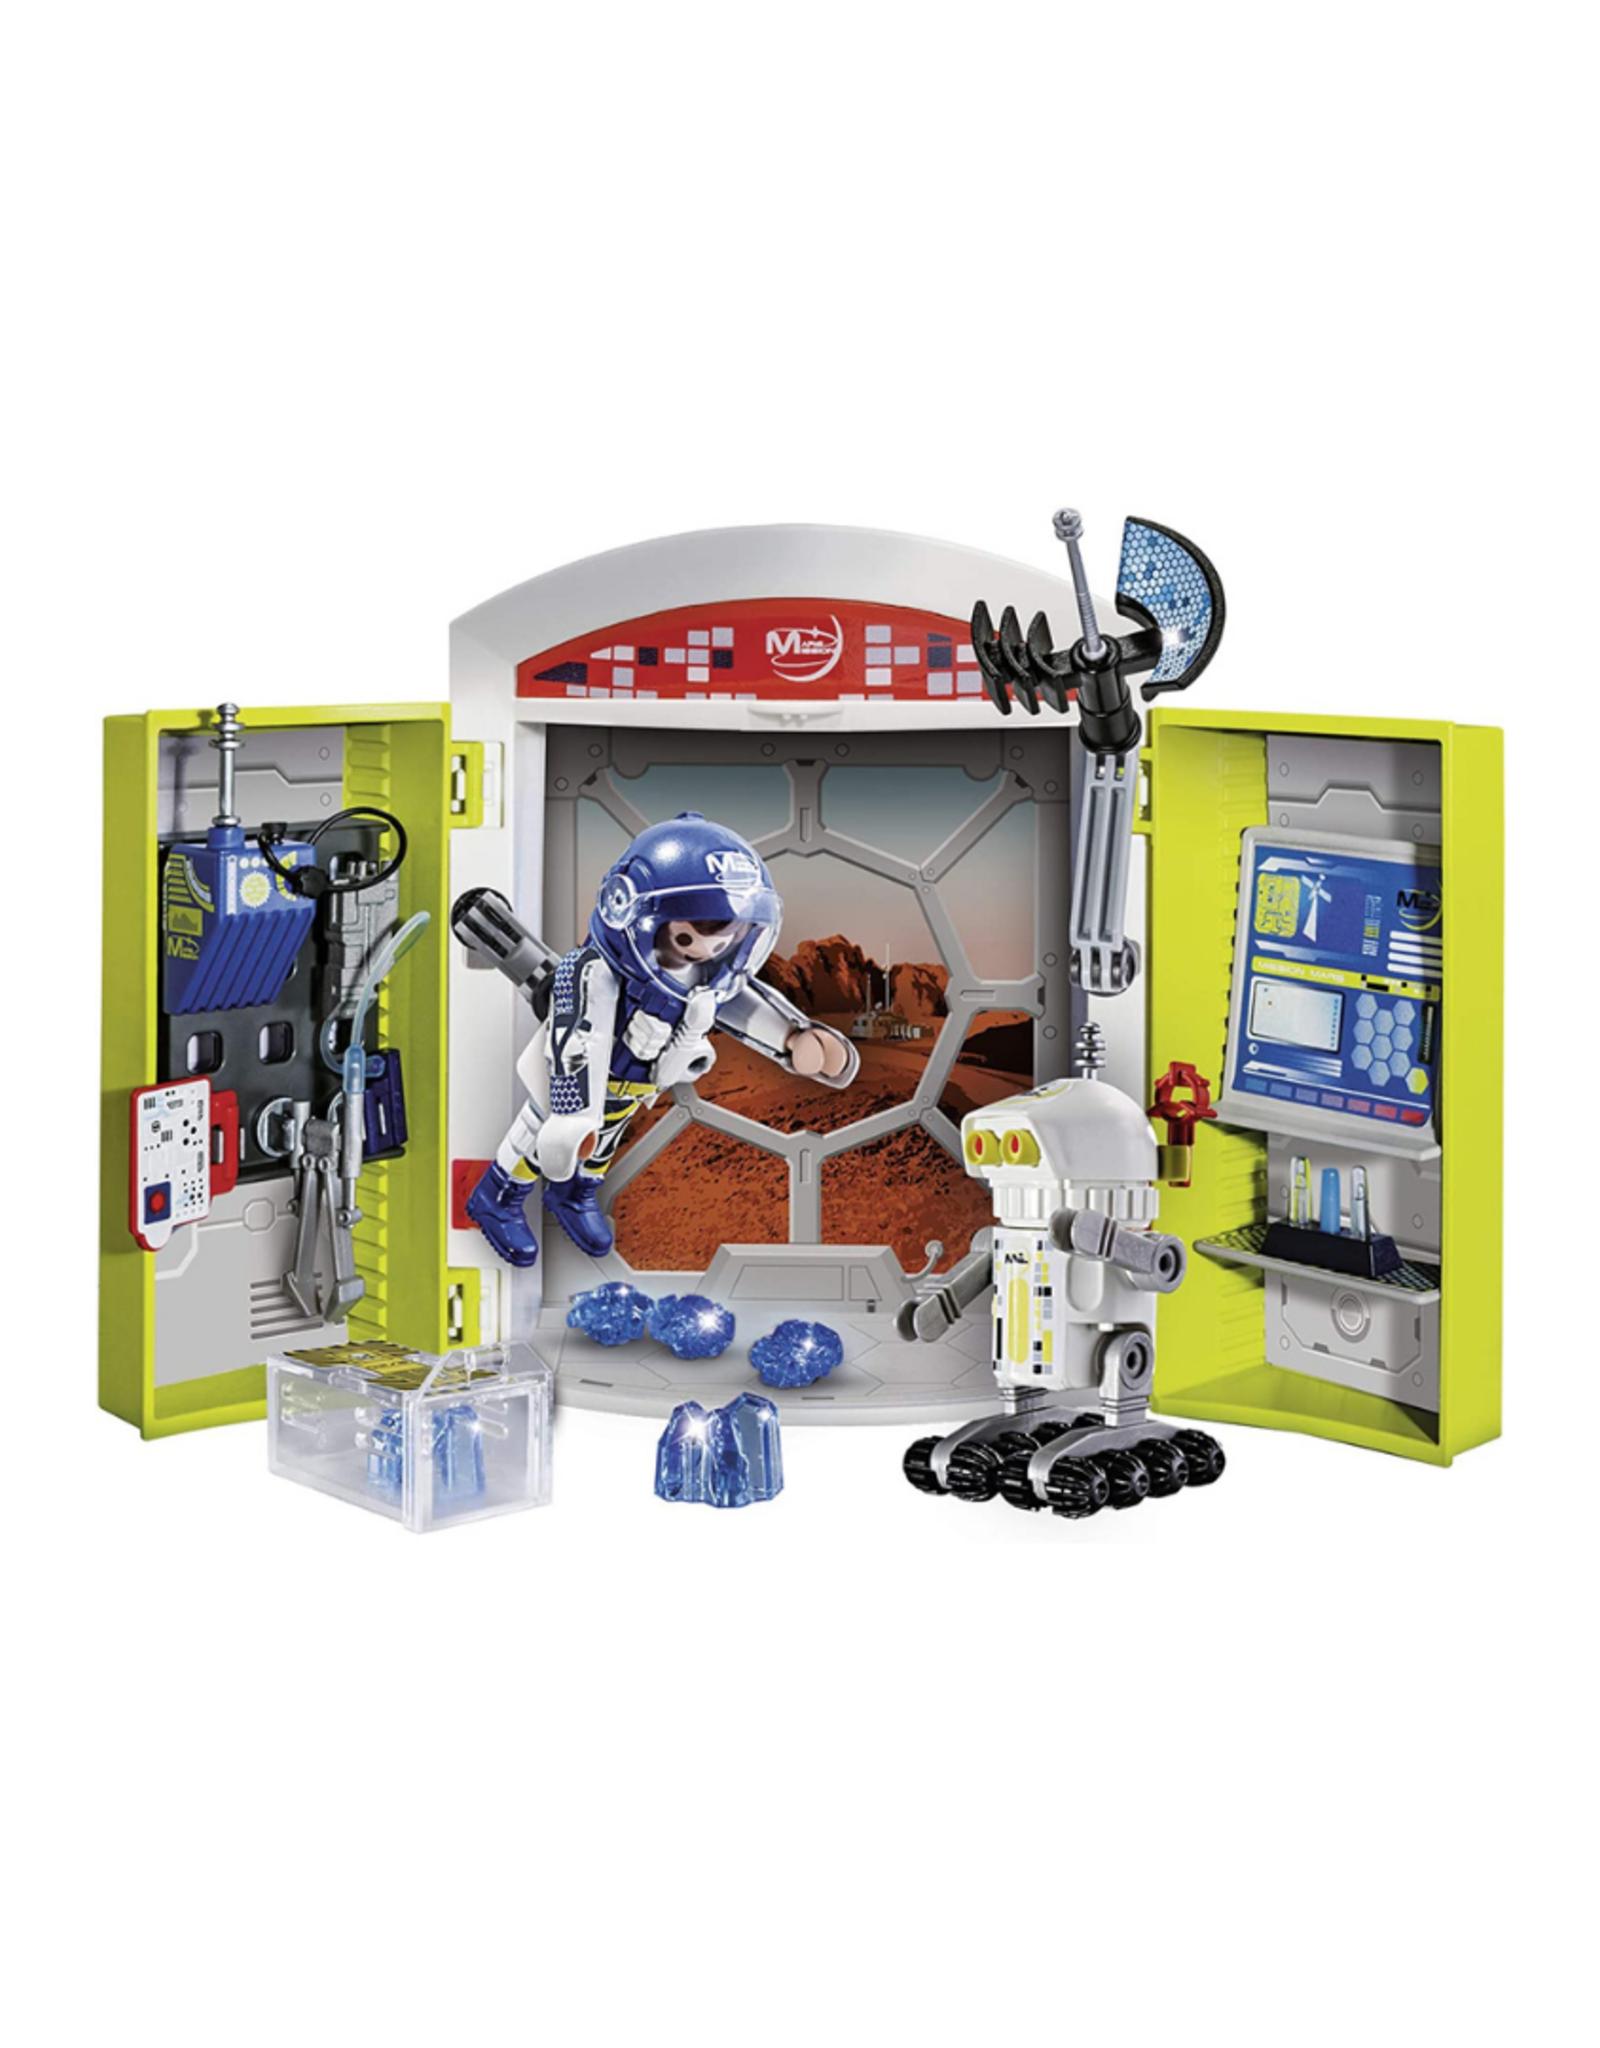 Playmobil PM - Mars Mission Play Box